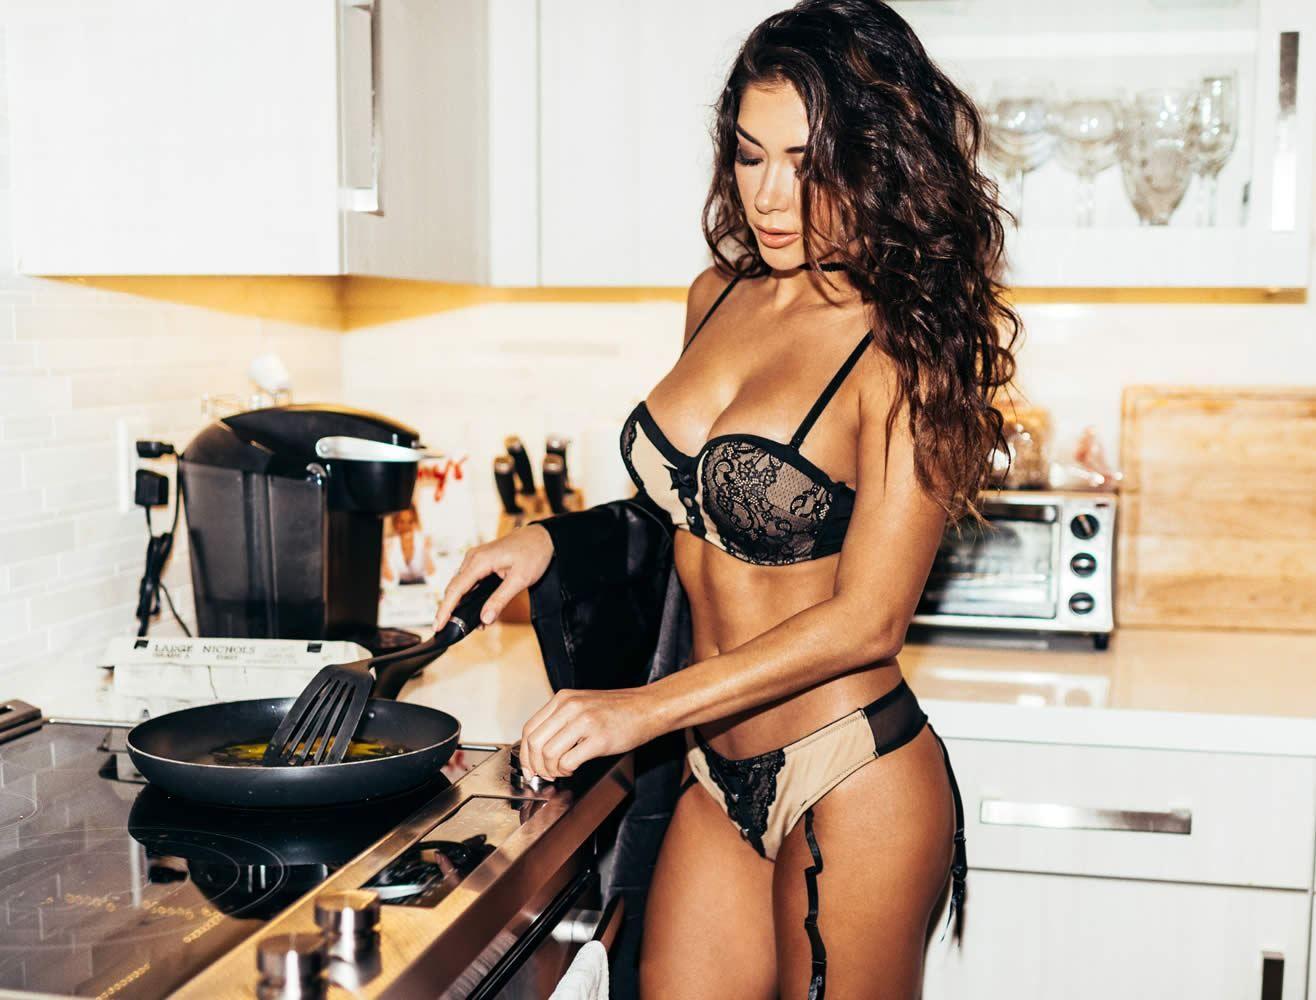 ICloud Arianny Celeste nude (87 photos), Sexy, Paparazzi, Instagram, cameltoe 2018